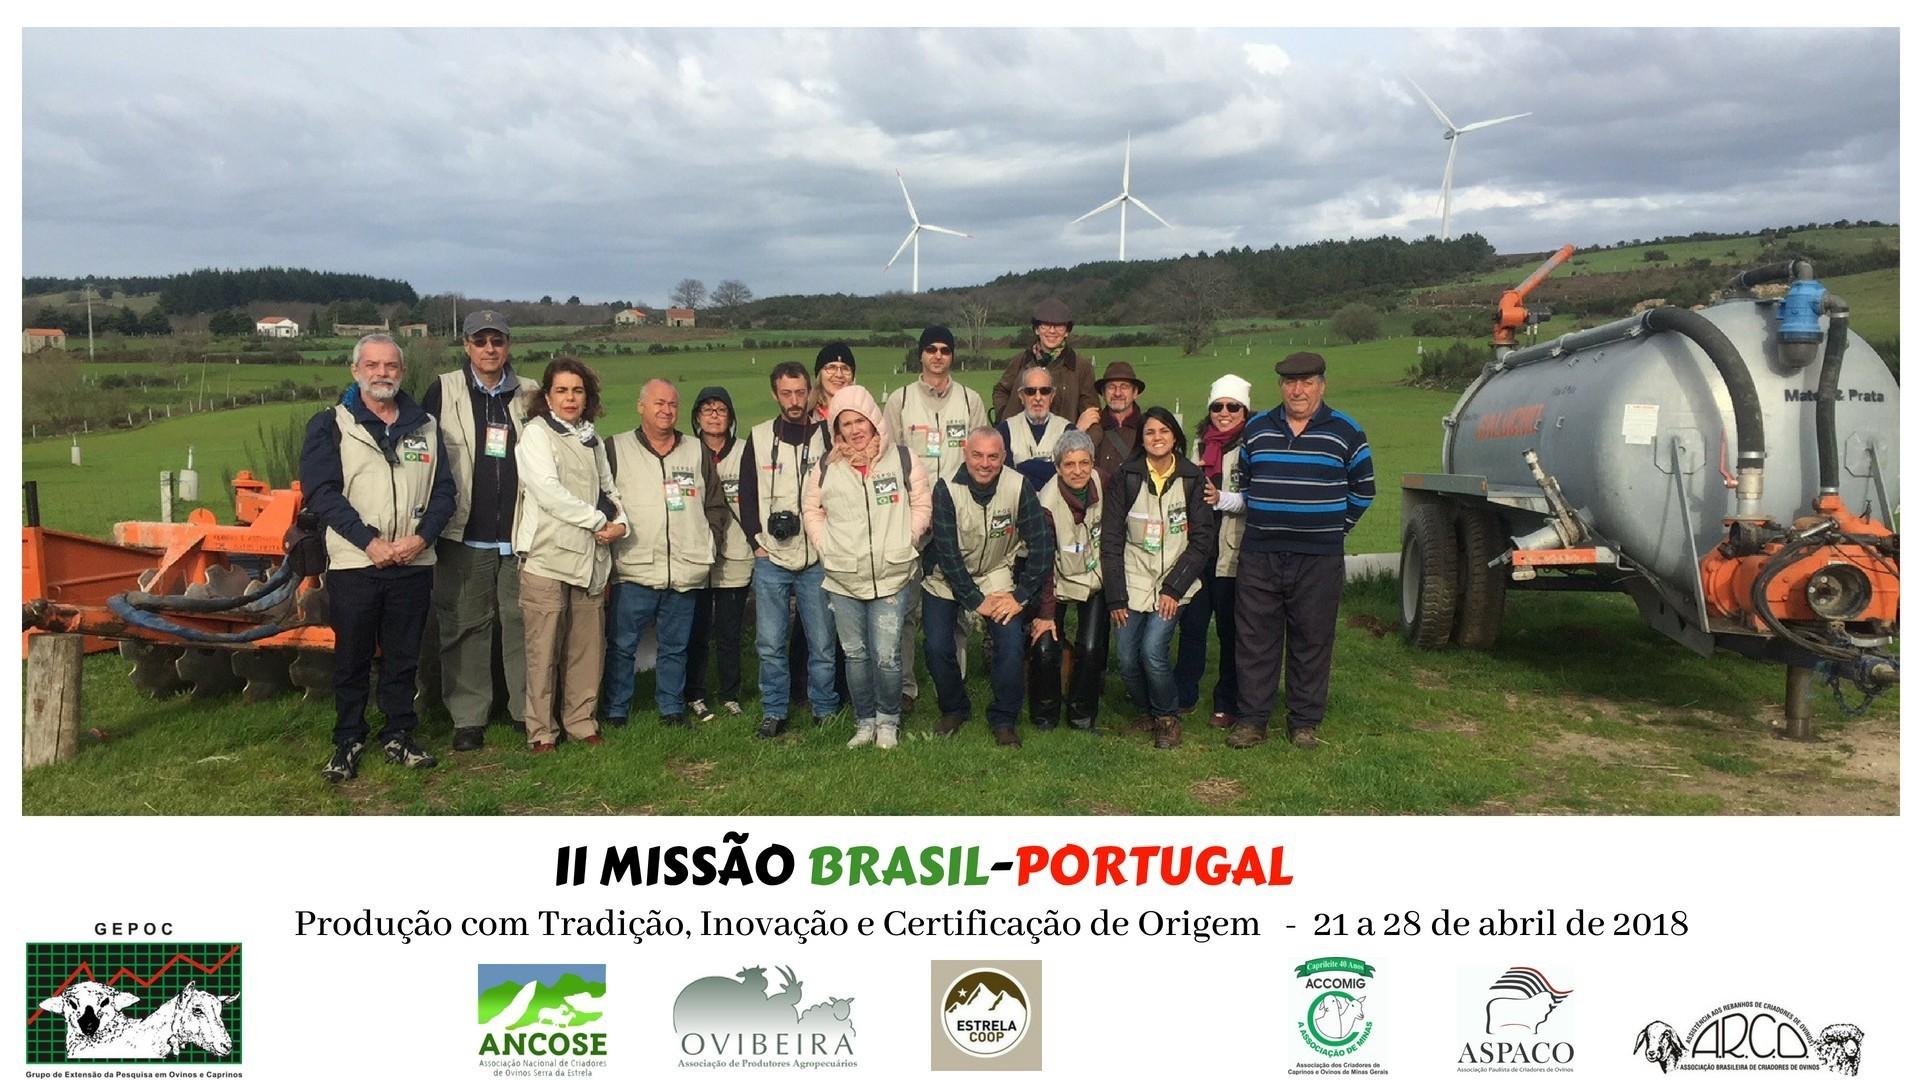 II MISSÃO BRASIL PORTUGAL 2018 21 a 28